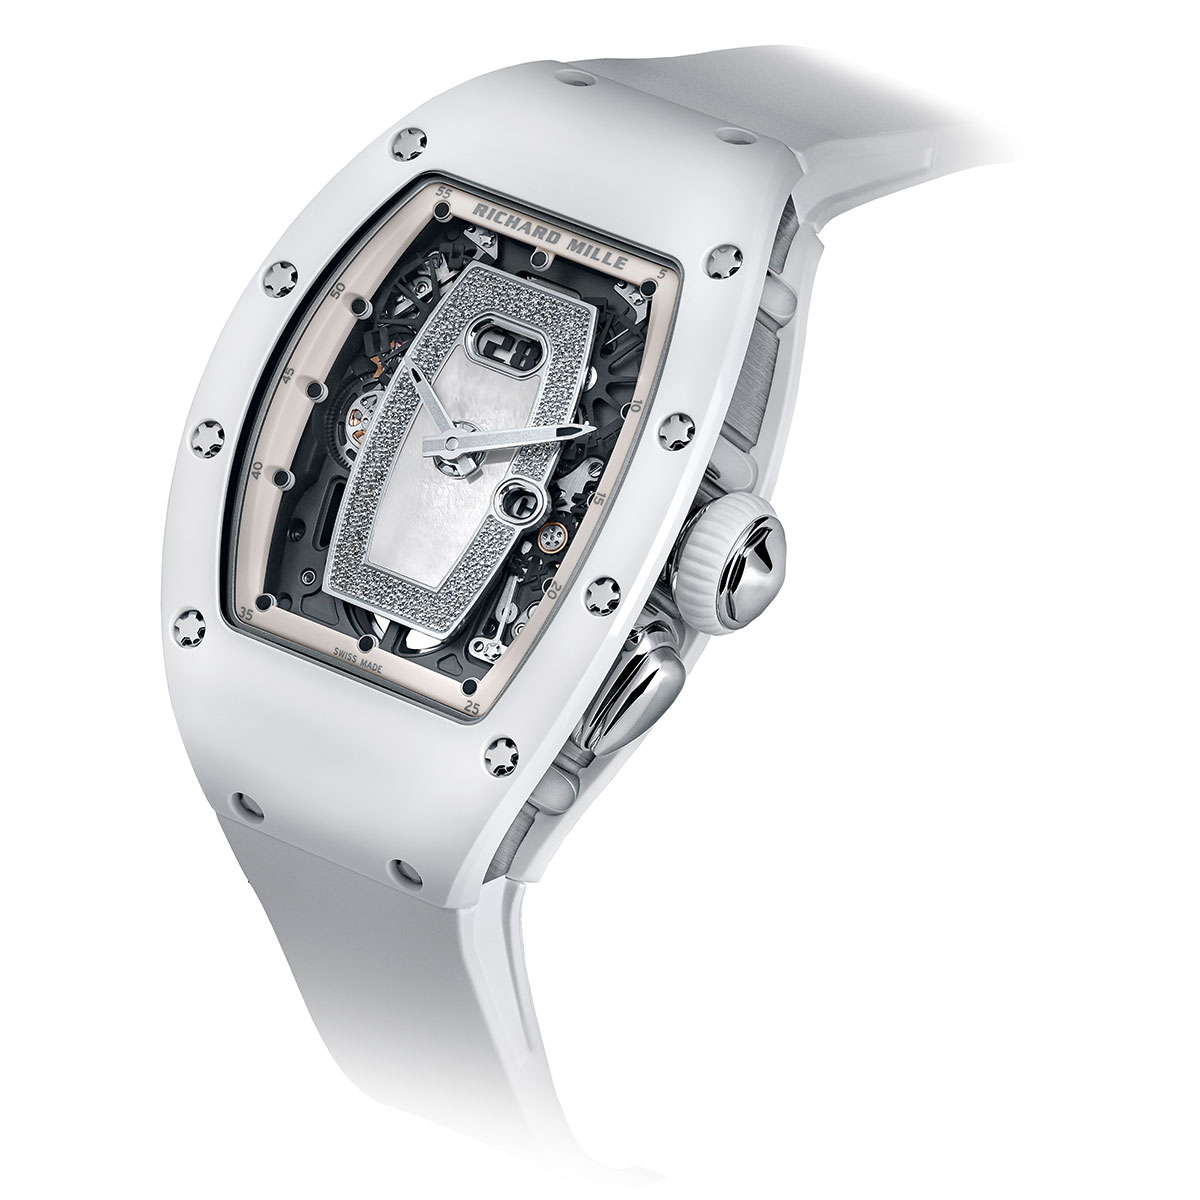 Đồng hồ Richard Mille RM 037 White Ceramic Automatic - 4